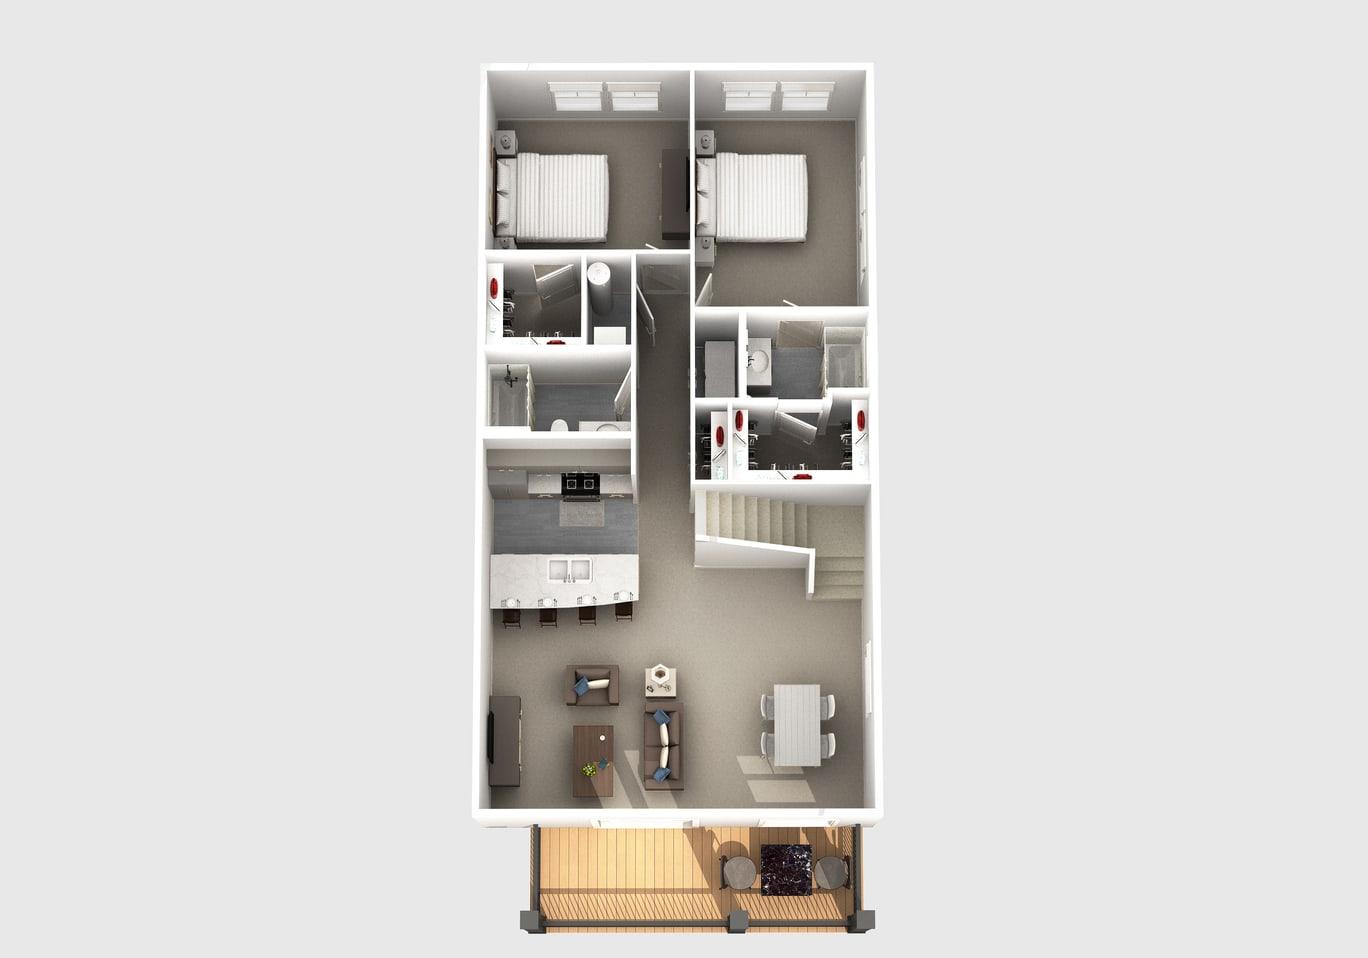 The Judd floor plan